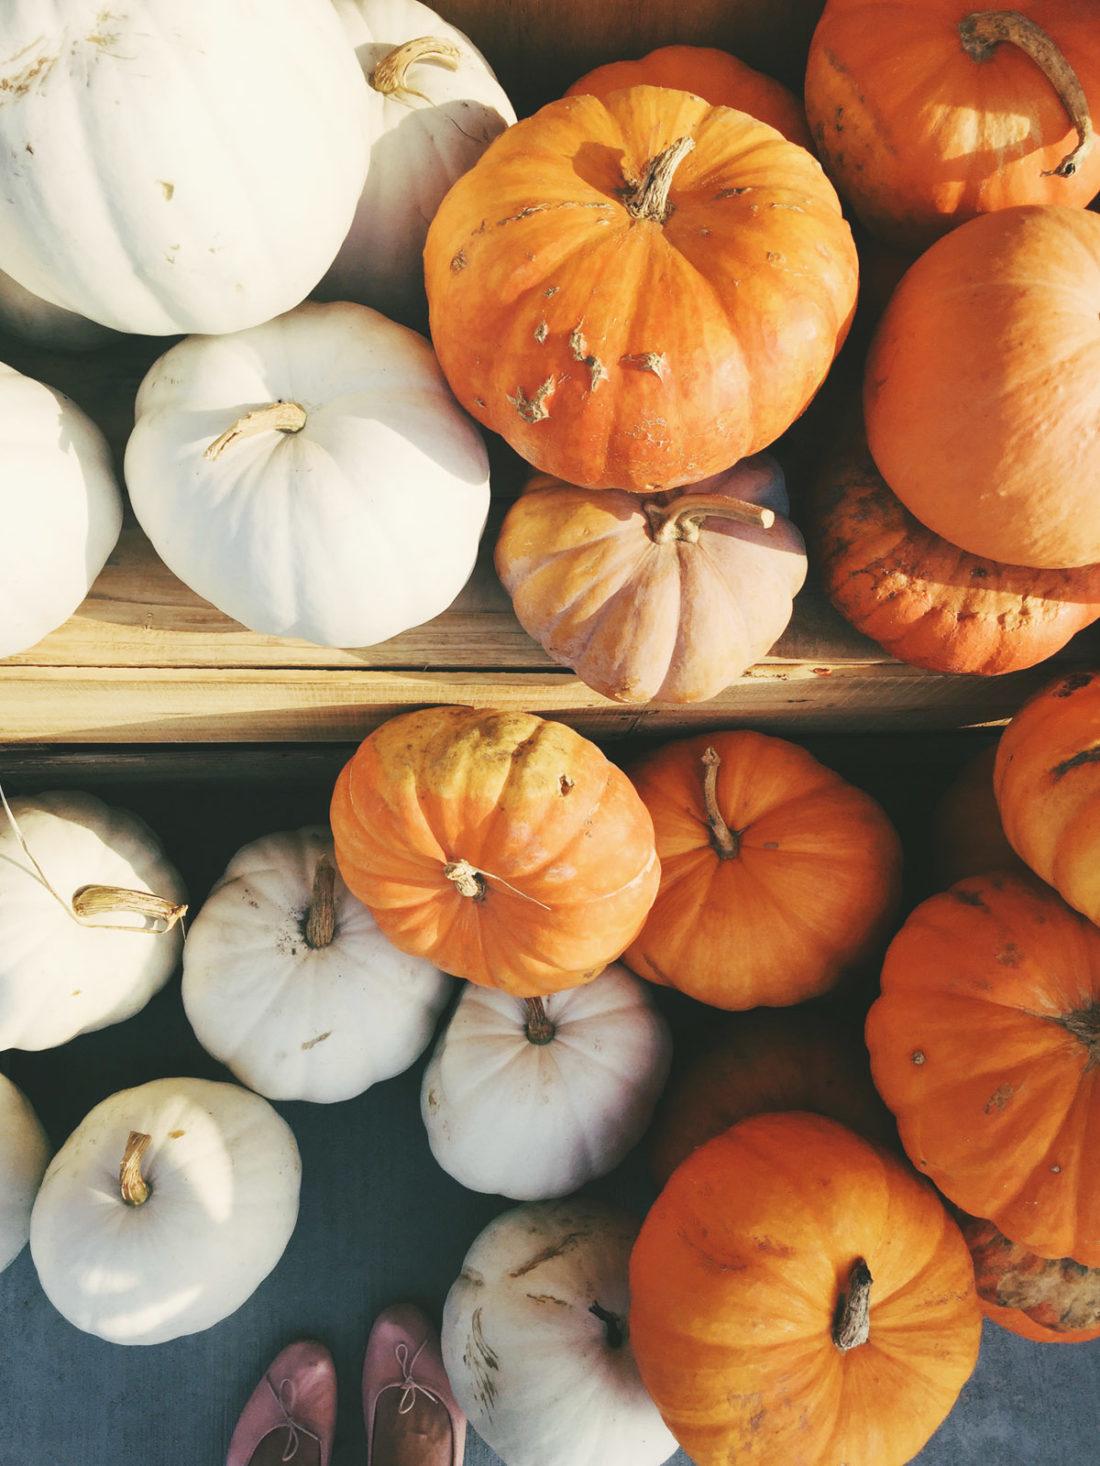 all the pumpkins!